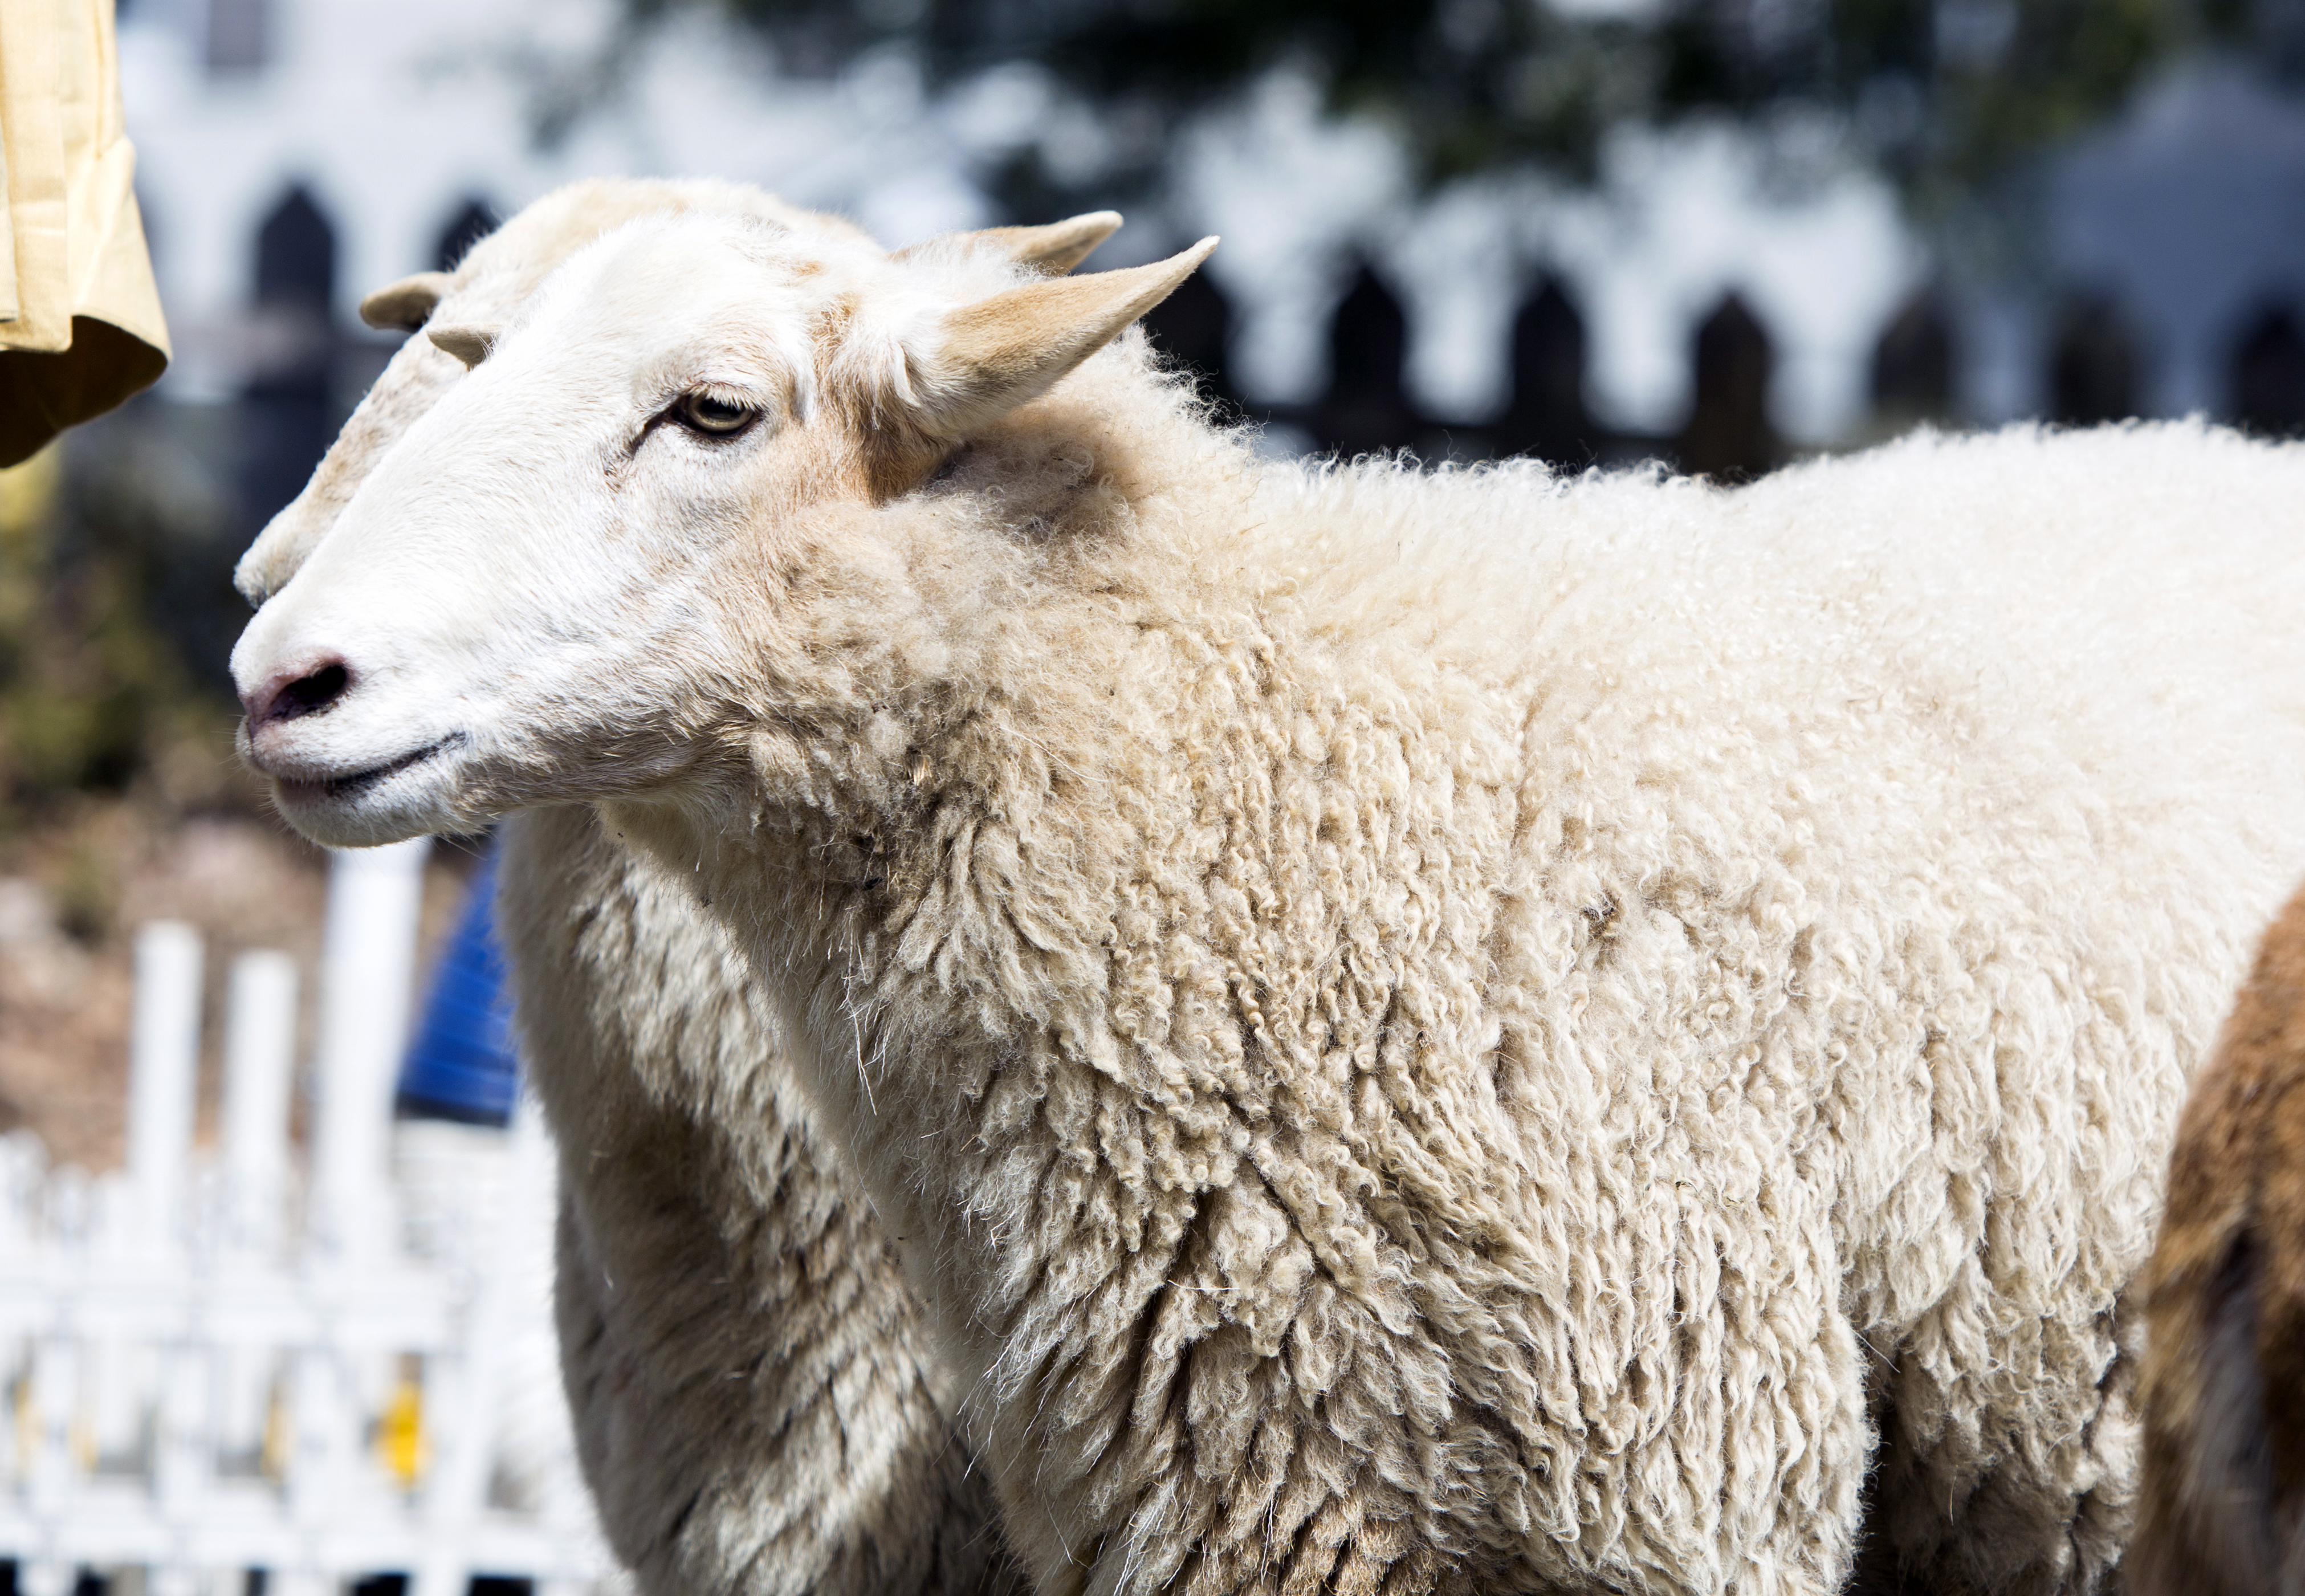 Sheep-to-Shawl Giveaway!